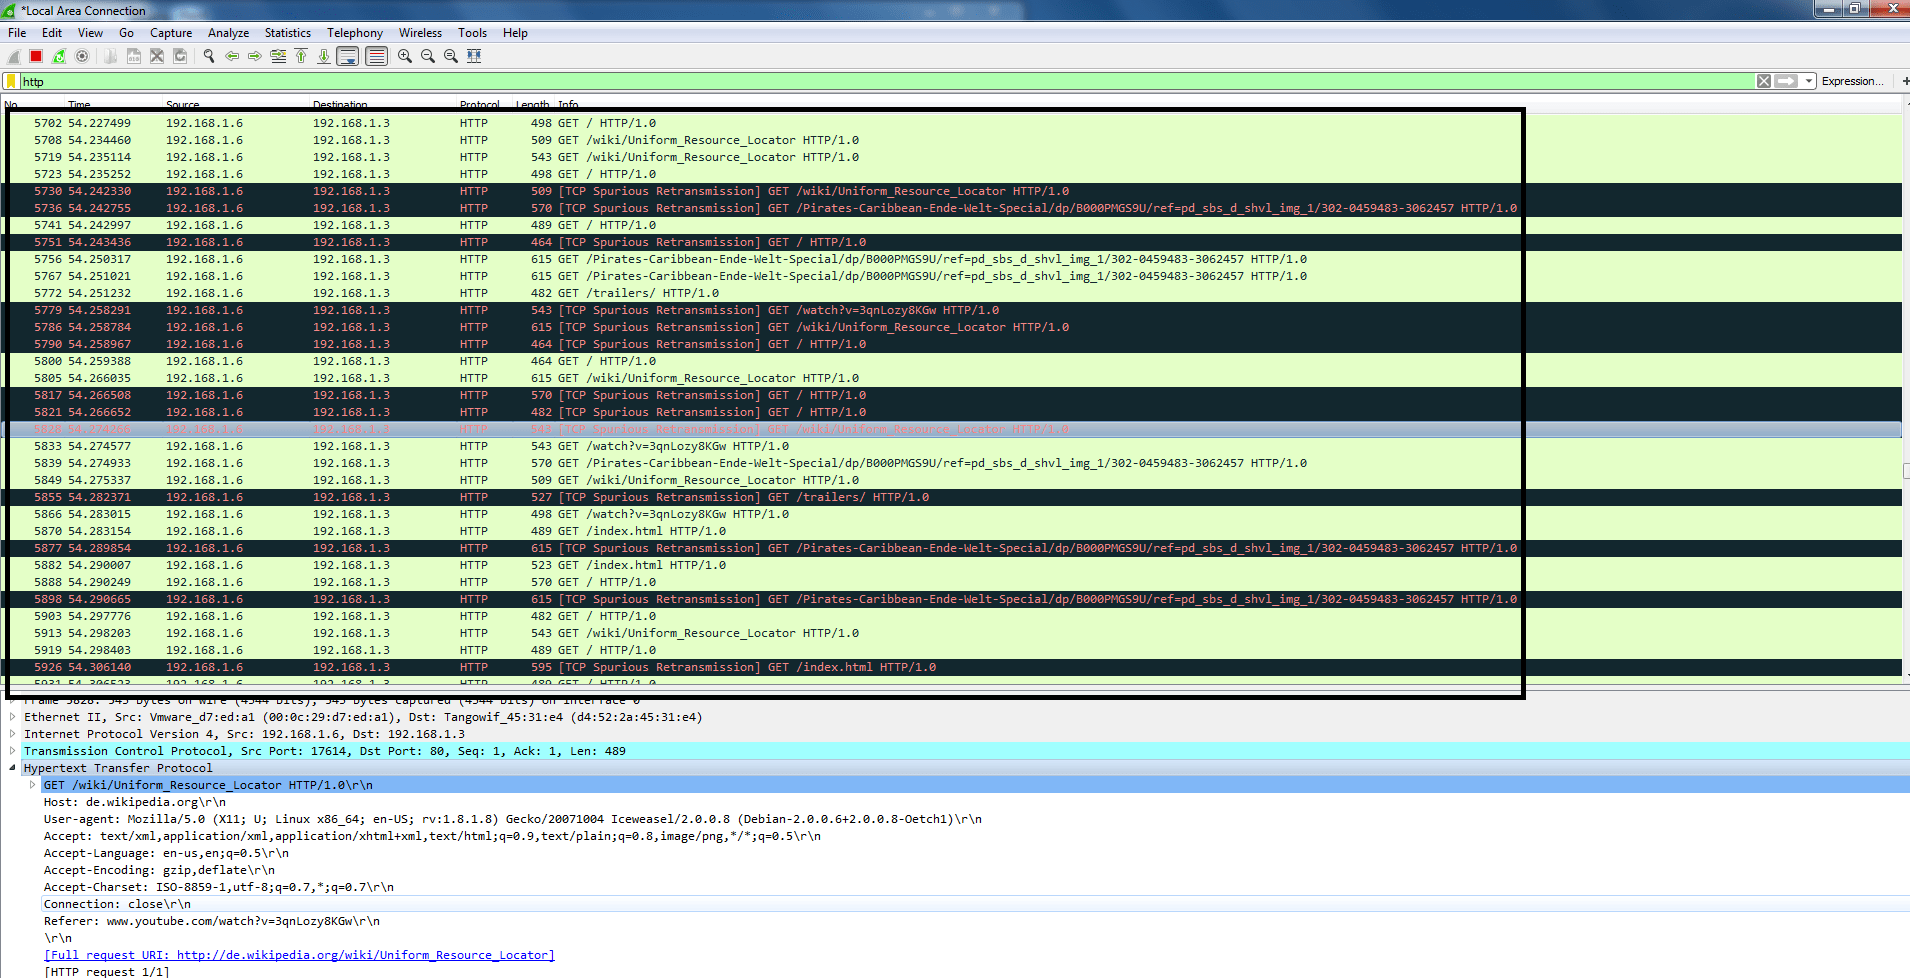 wireshark with random URL